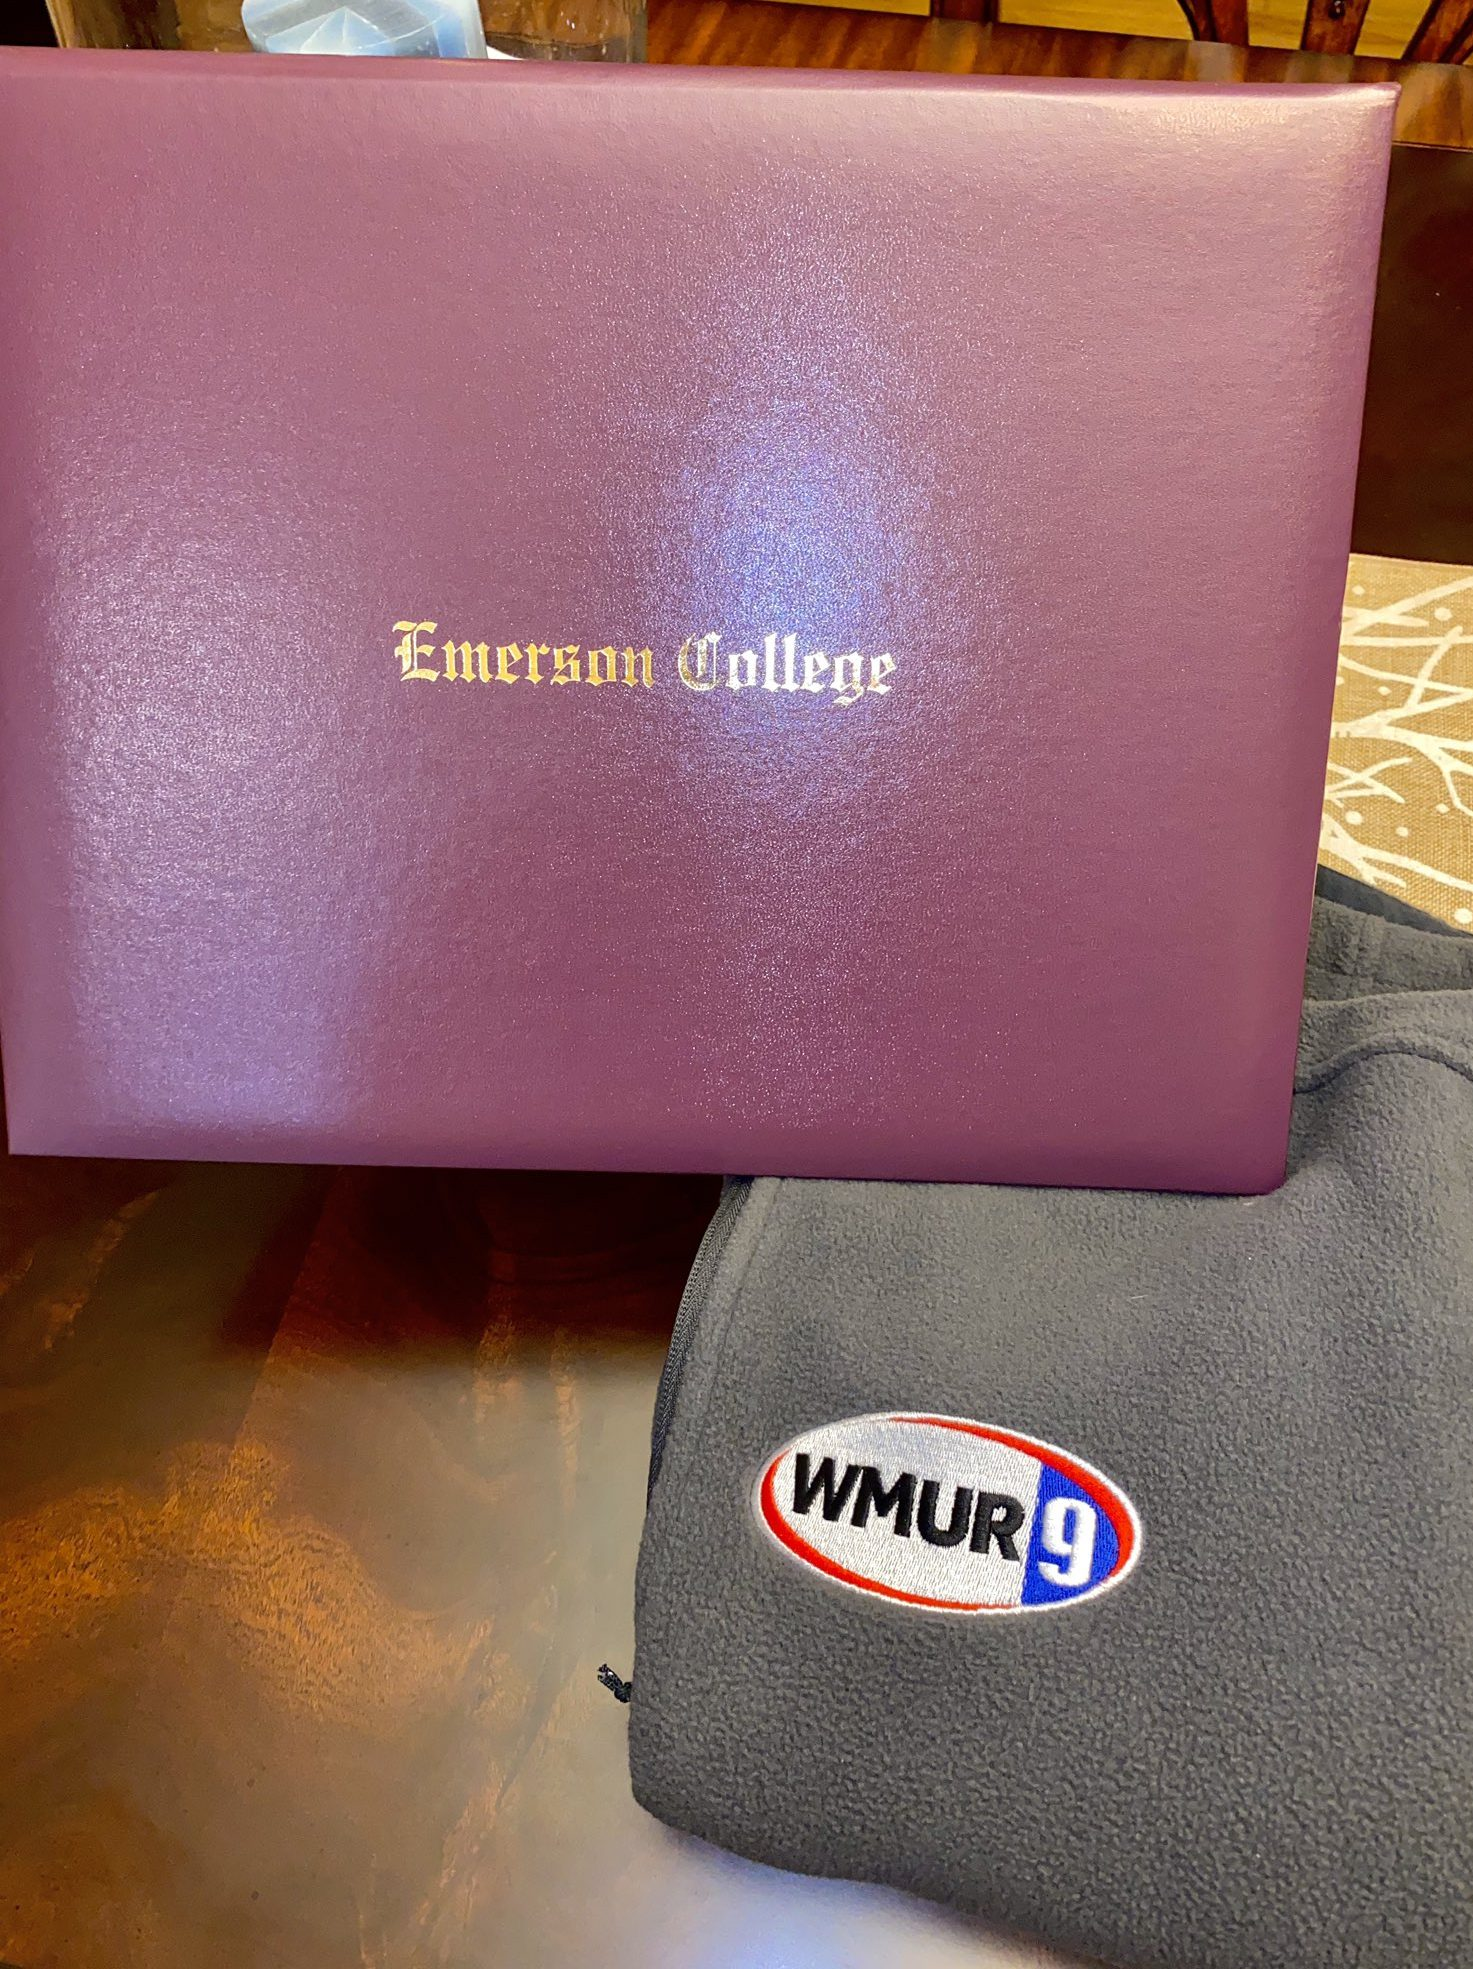 An Emerson College diploma belonging to Natalie Benoit '20 resting next to a WMUR News 9 sweatshirt, marking Benoit's next big life transition.